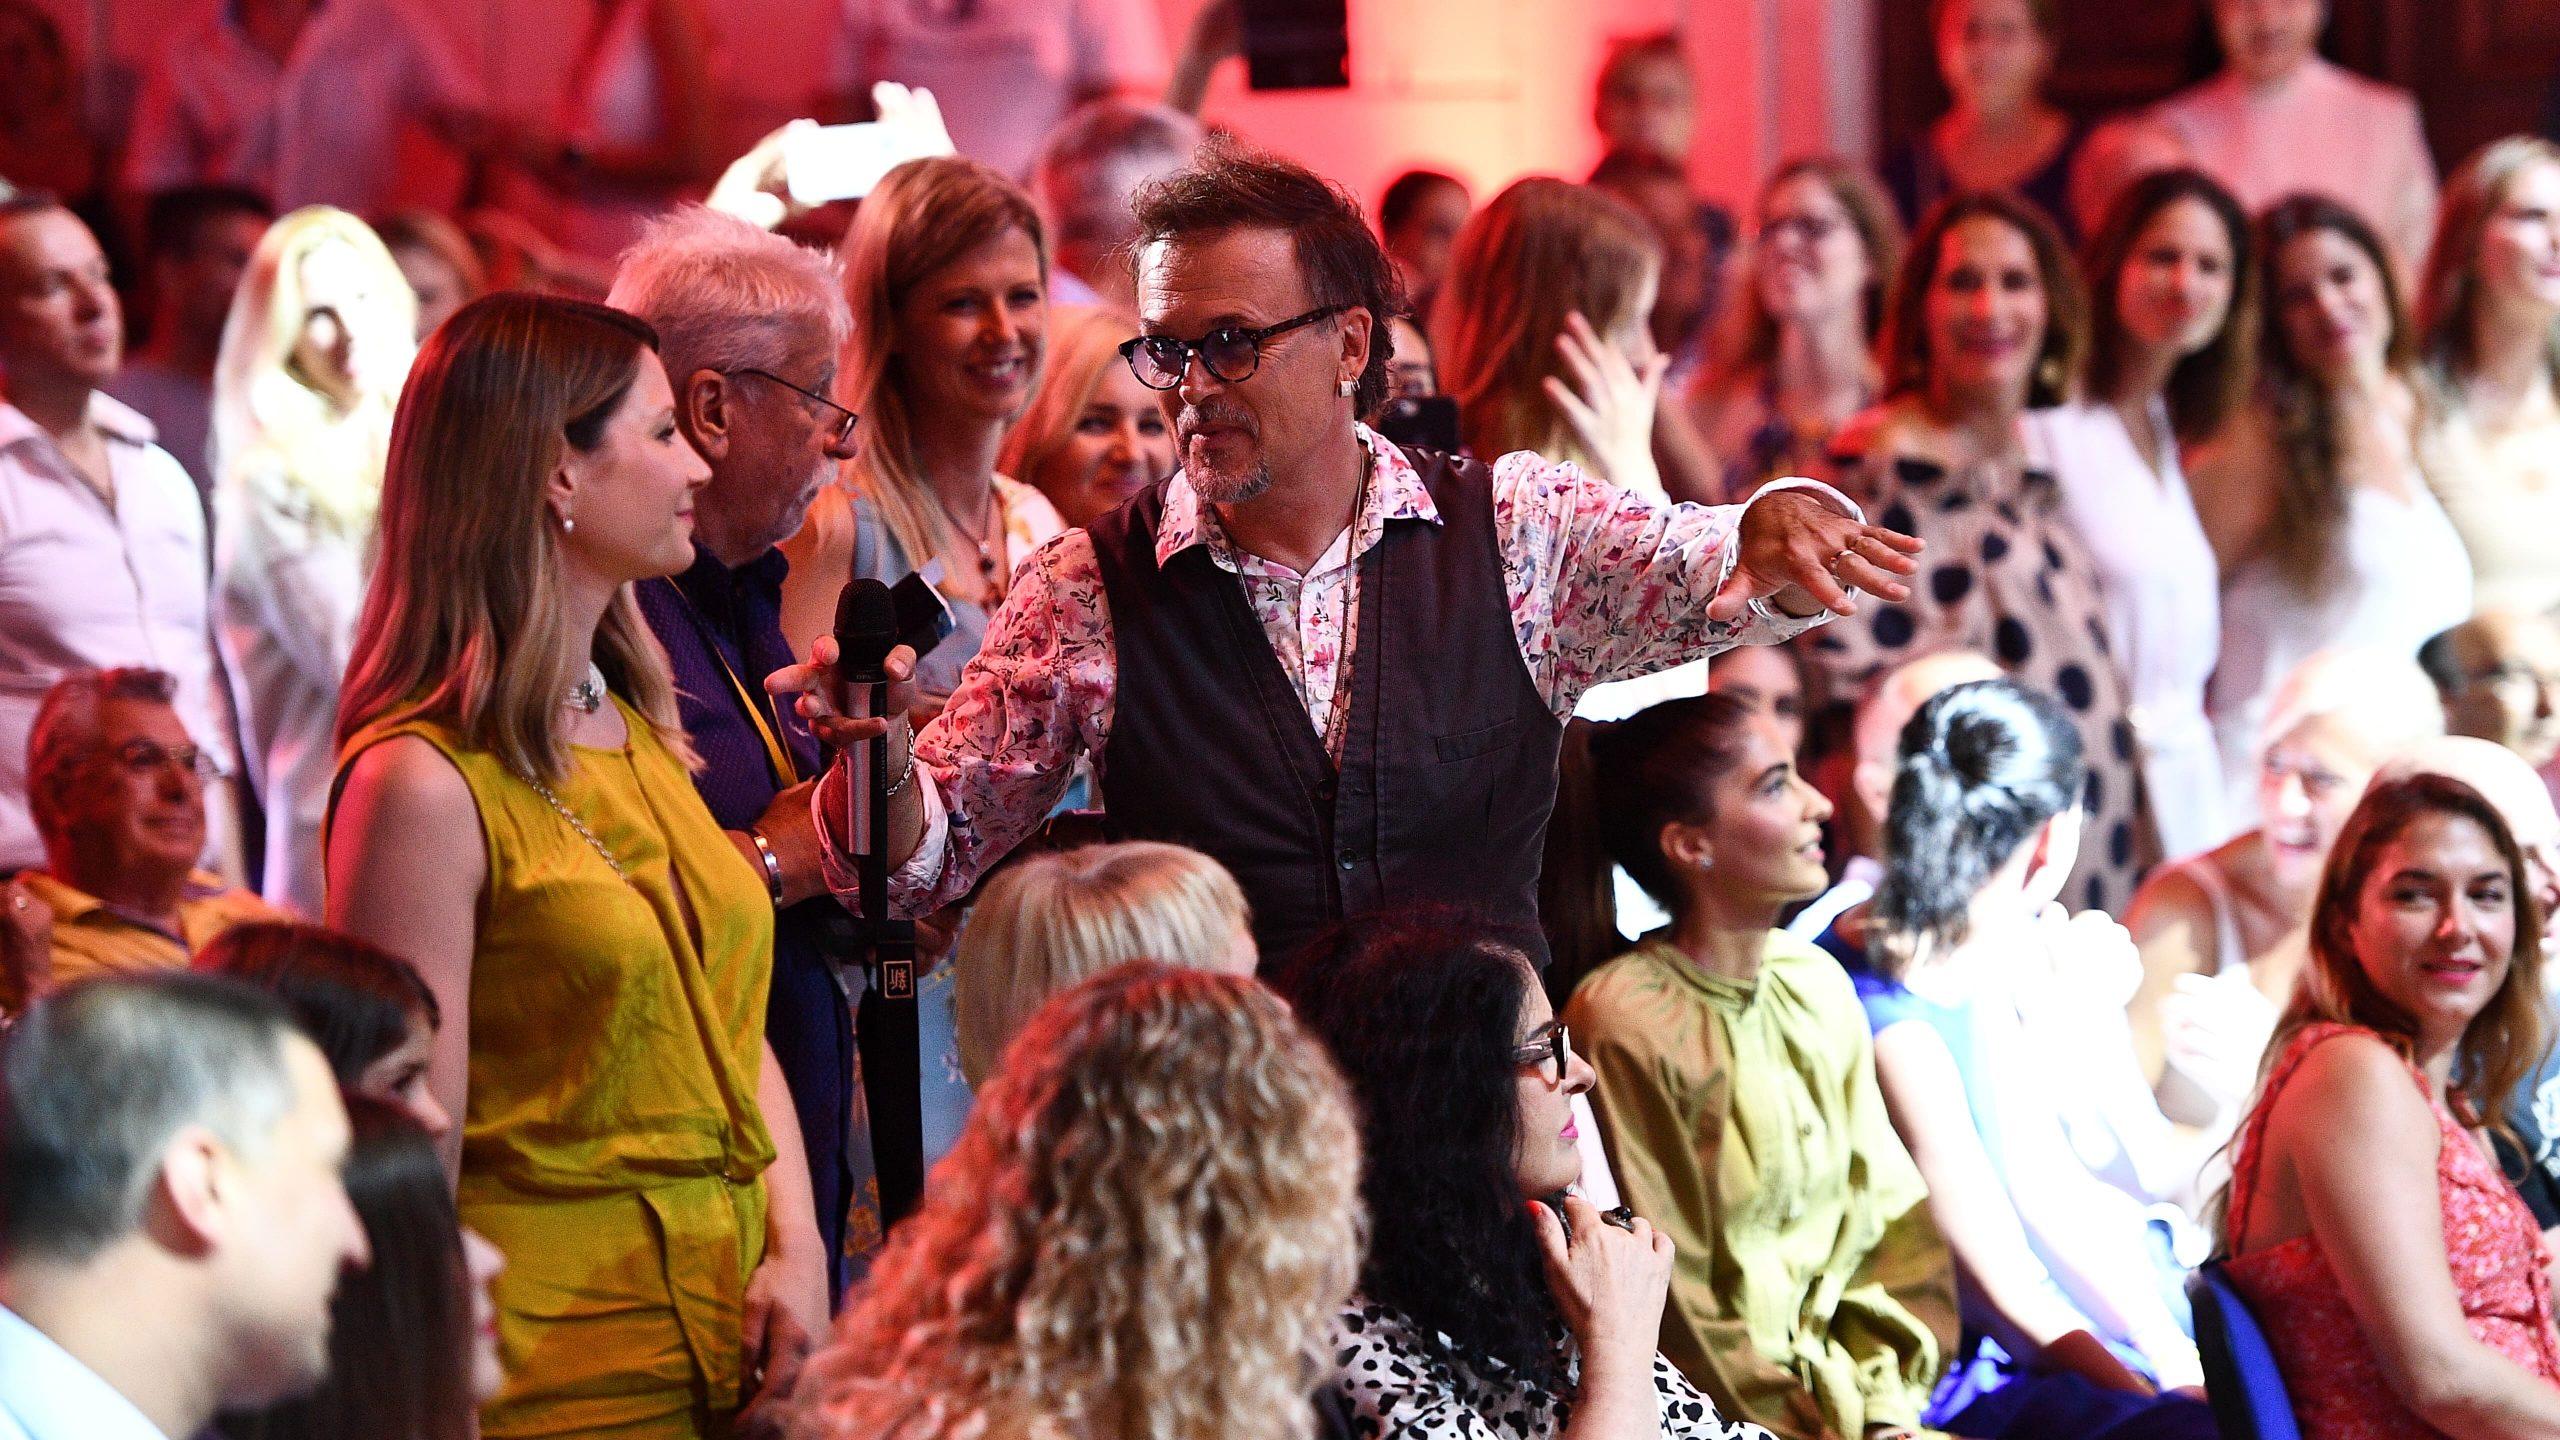 Gibonni među publikom, Foto: ANTE ČIZMIĆ/CROPIX